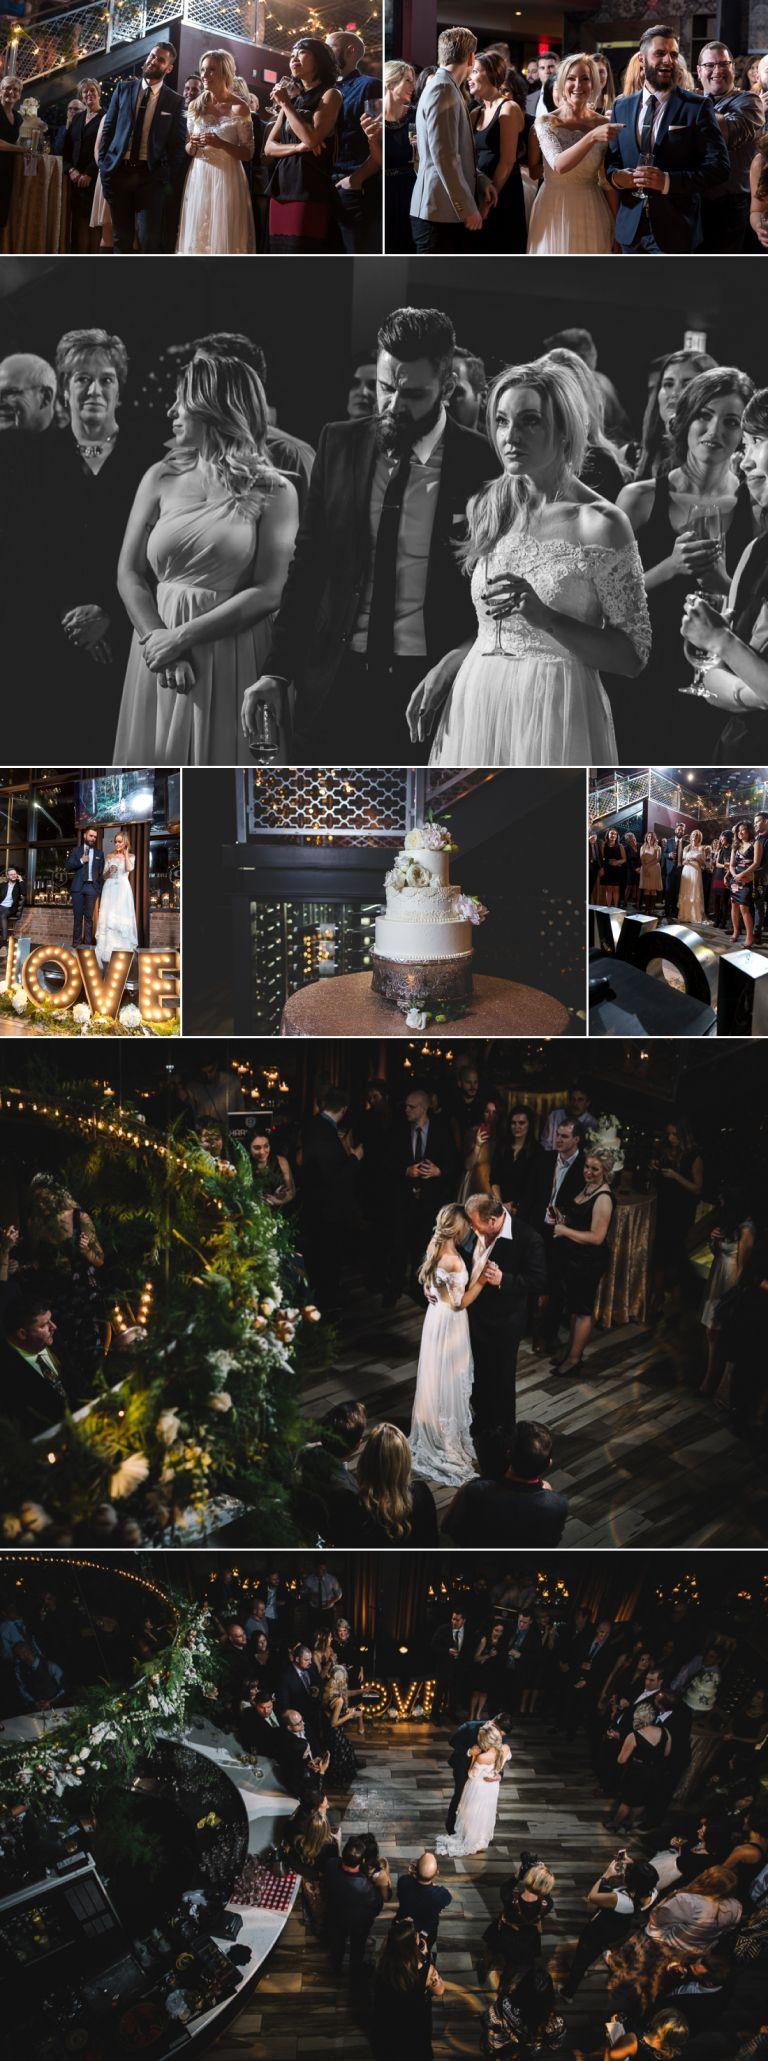 Nicole Ashley Wedding Photos at the Parlour Restaurant